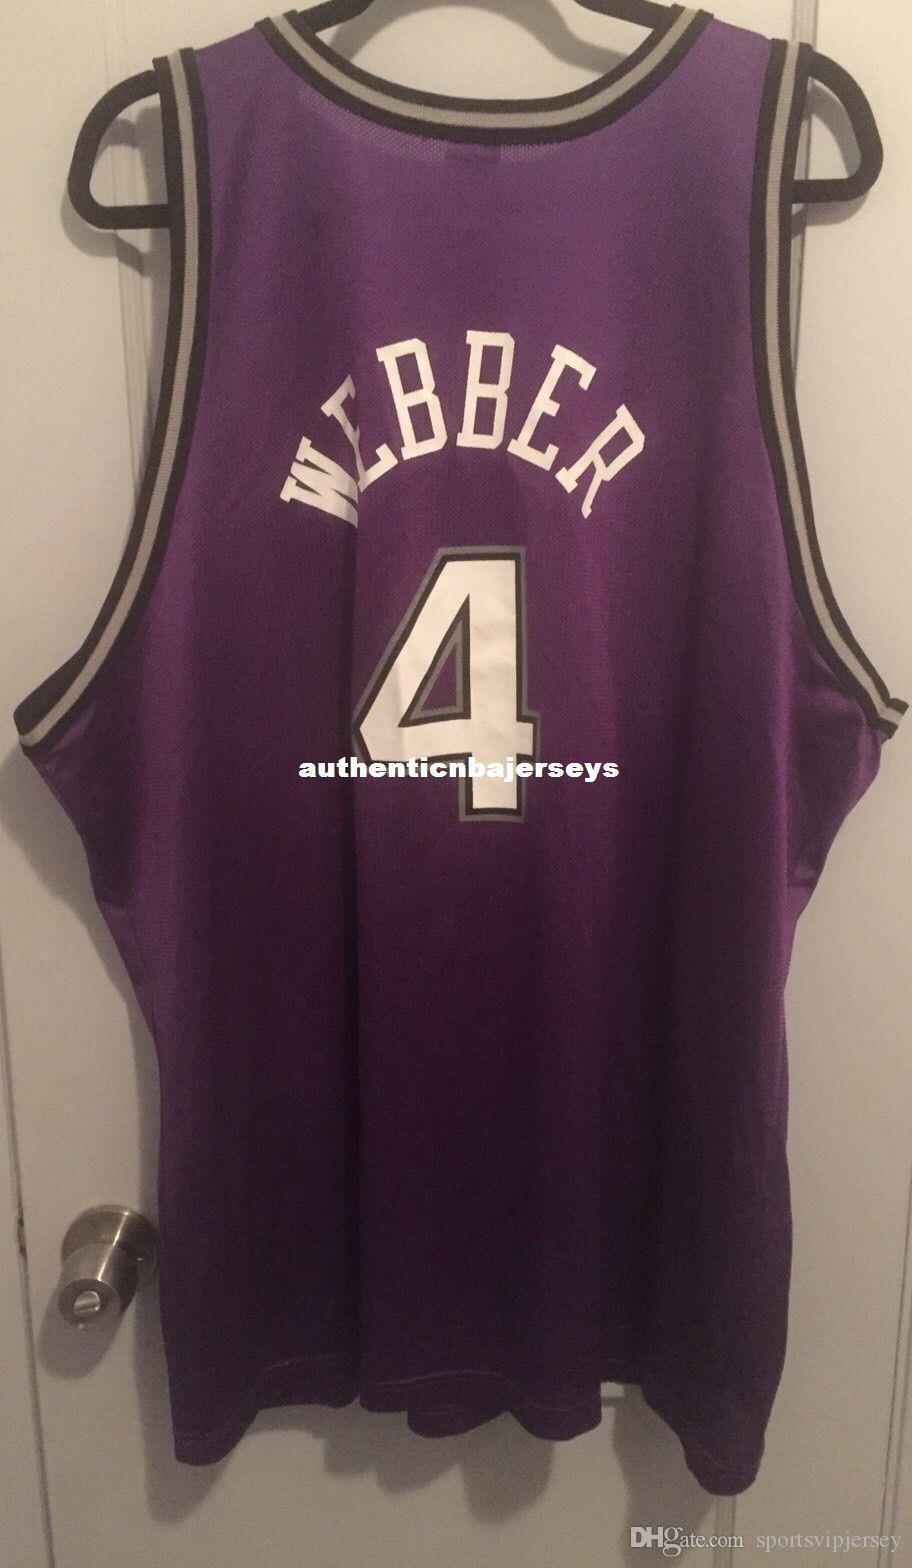 Günstige Großhandel Chris Webber 4 # Jersey-Champion 90s Mint Bibby T-Shirt Weste genähtes Basketball-Trikots Ncaa